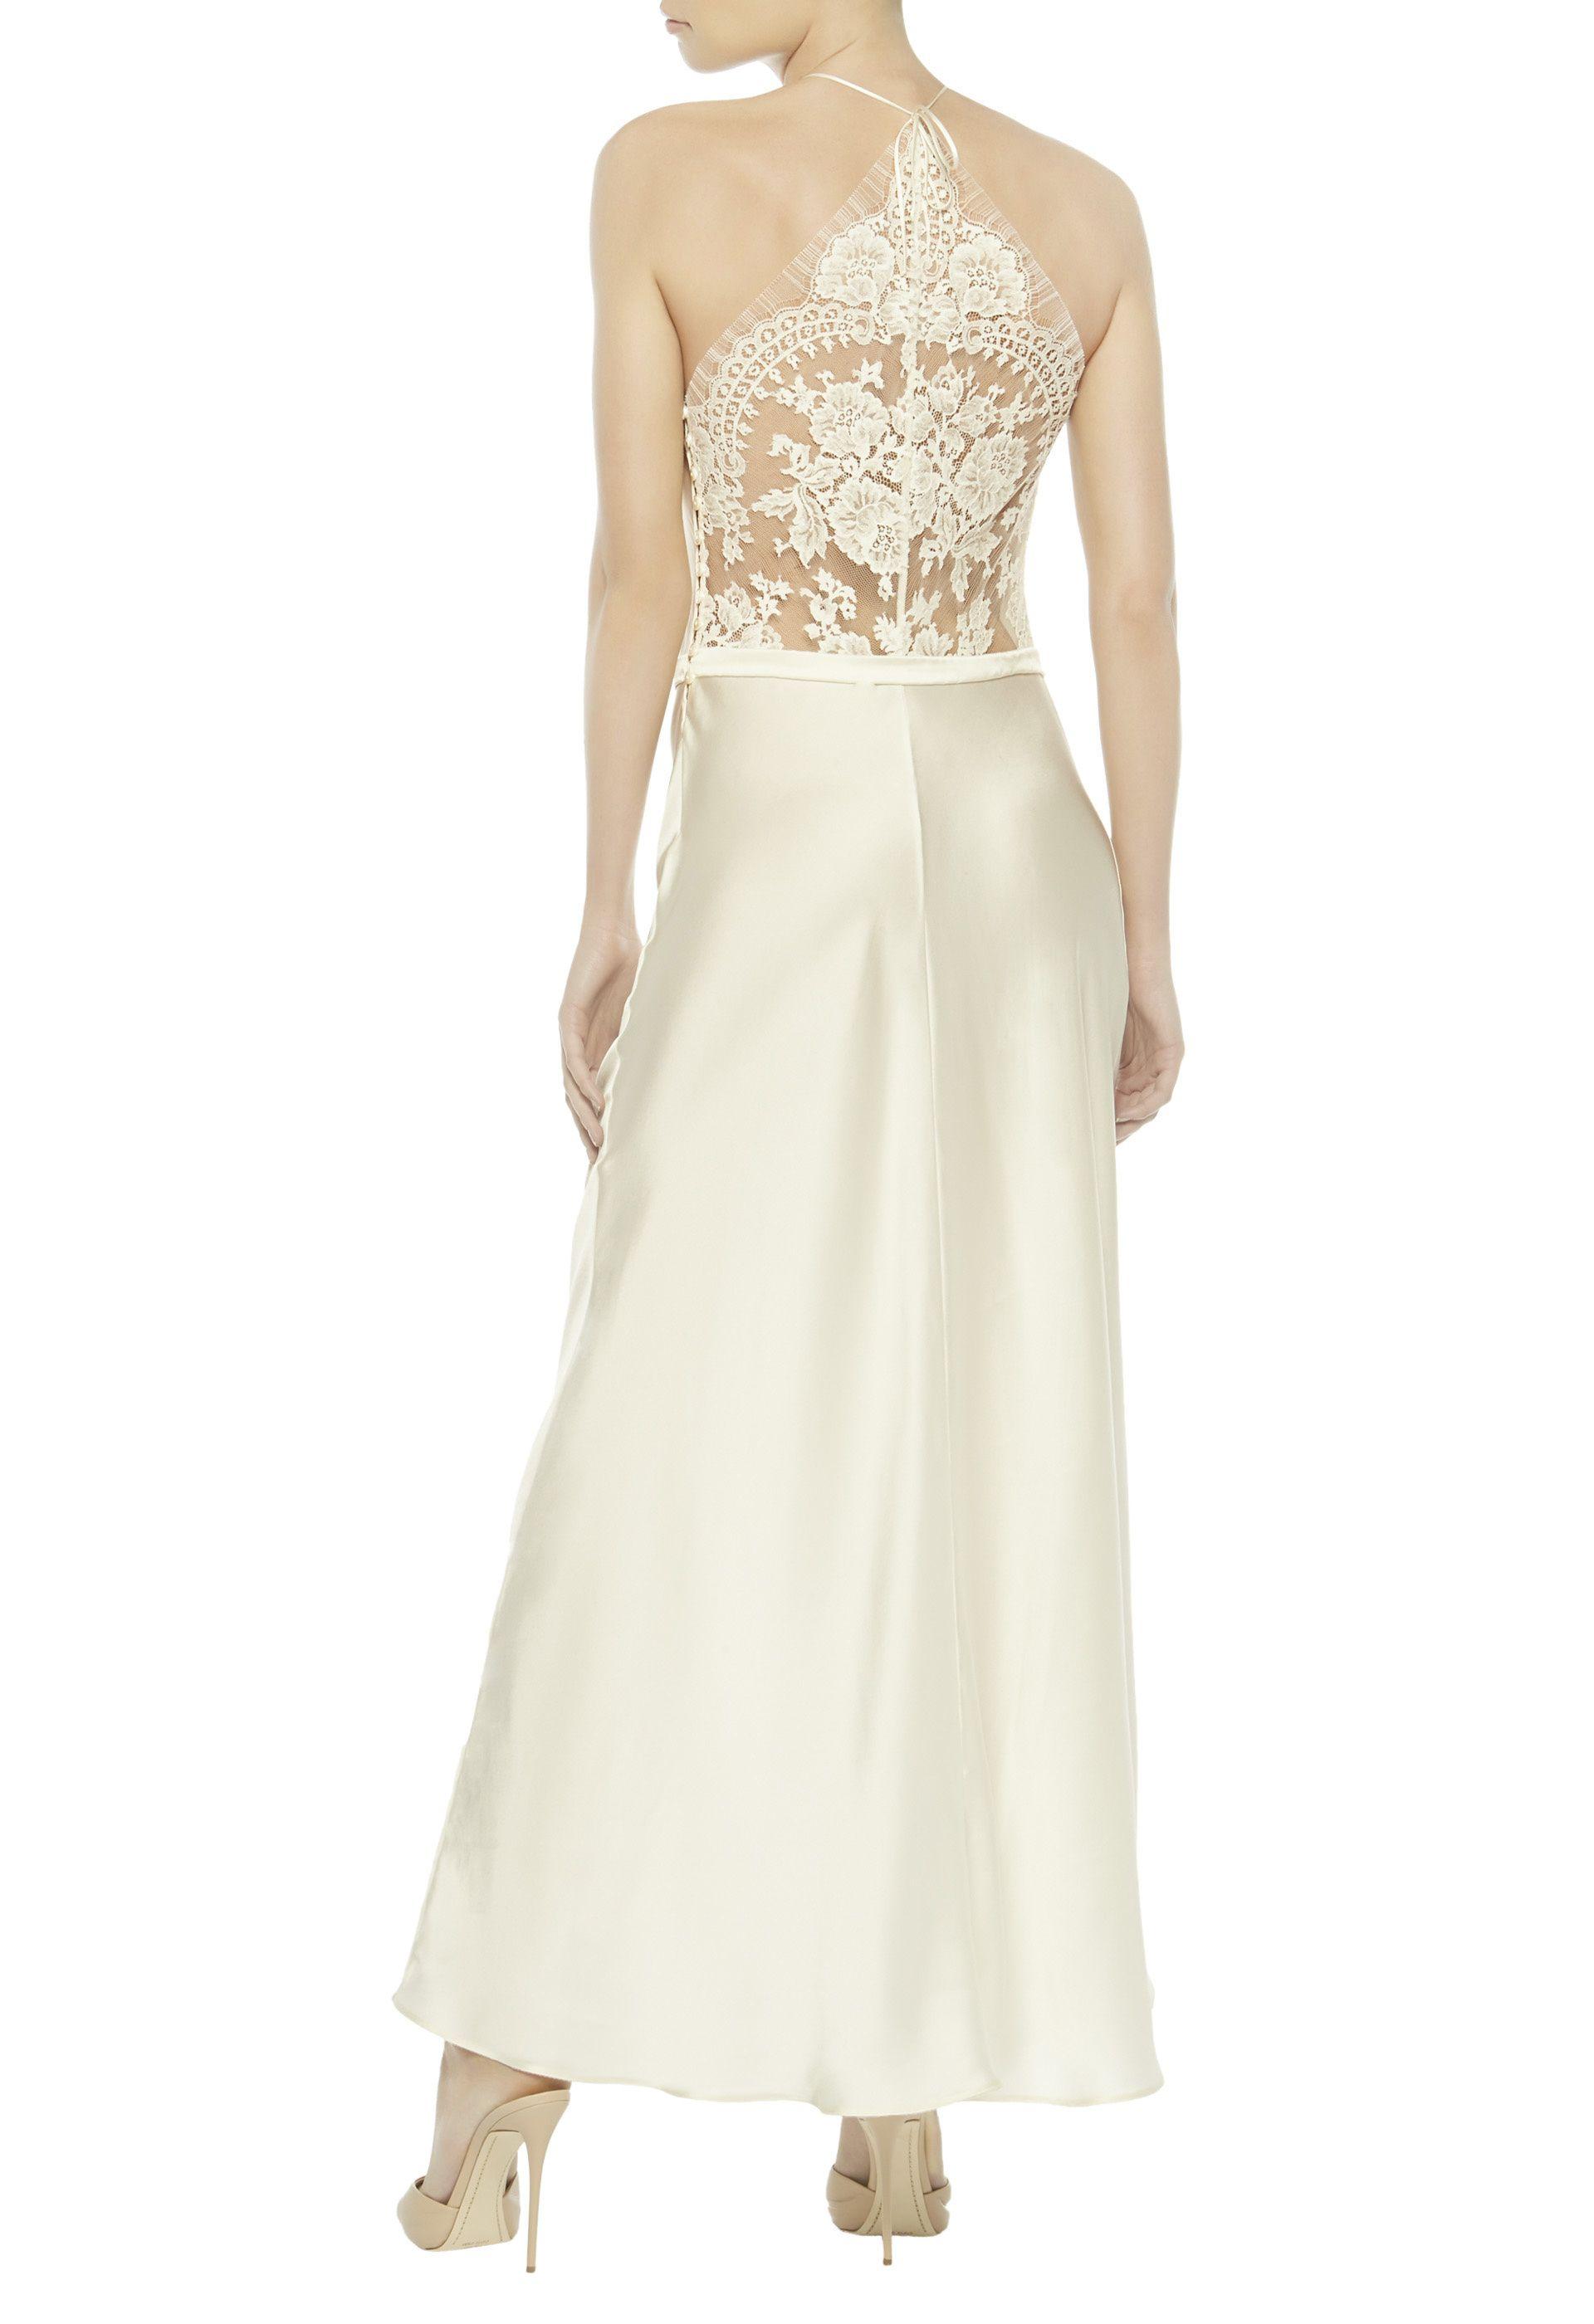 abd4c96886 Freesia Long Dress